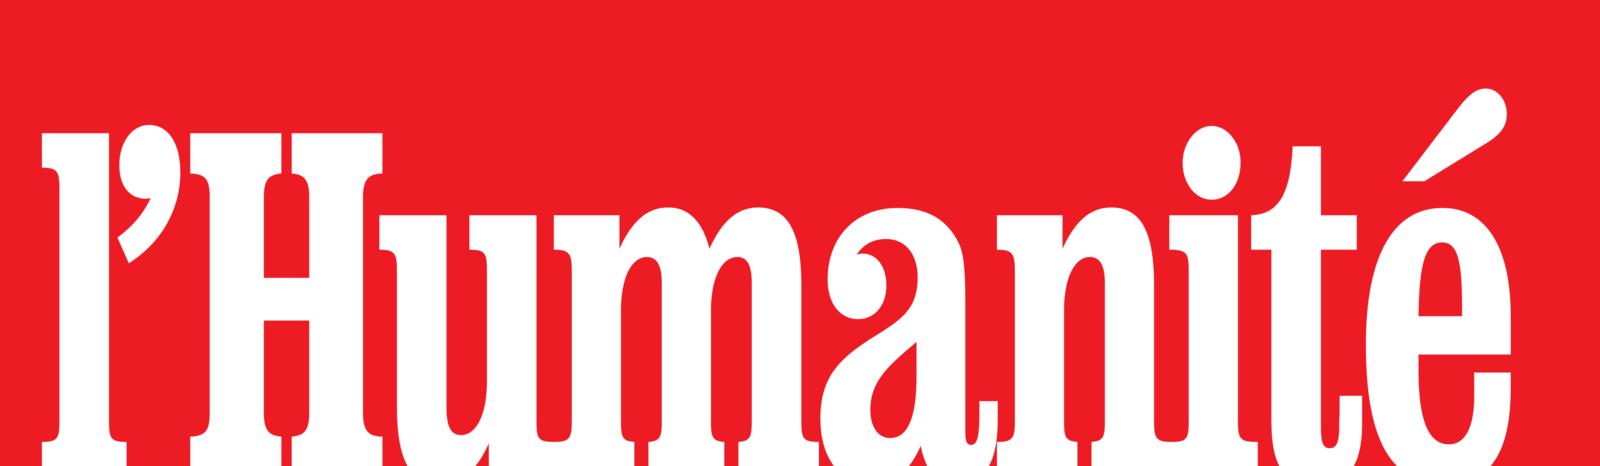 Françafrique: l'assassinat de Thomas Sankara - Dossier de Marc de Miramon dans L'Humanité, 9 avril 2021